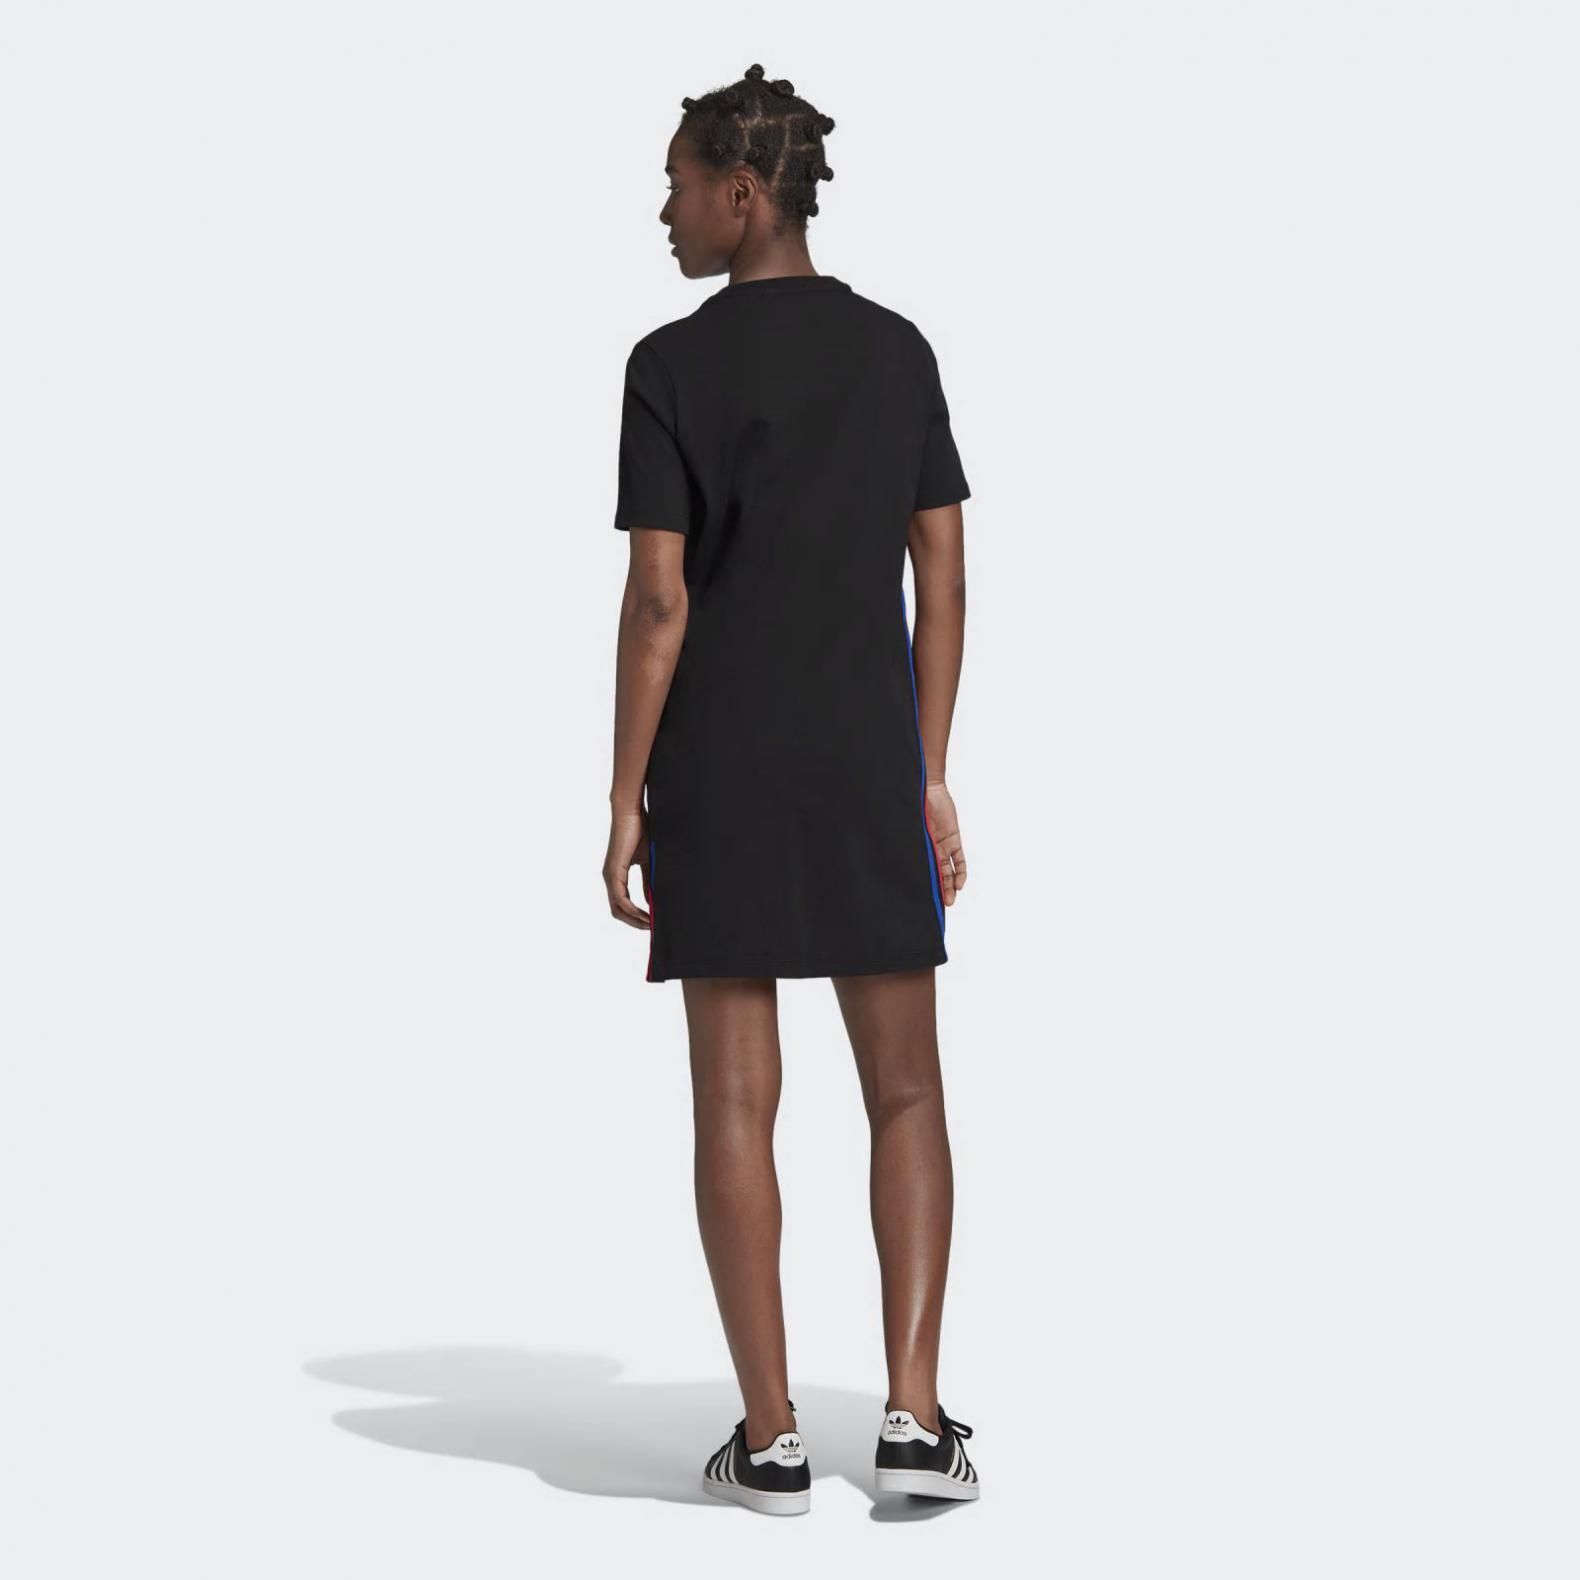 Adidas Originals Röcke  Kleider  Adicolor 3D Trefoil T